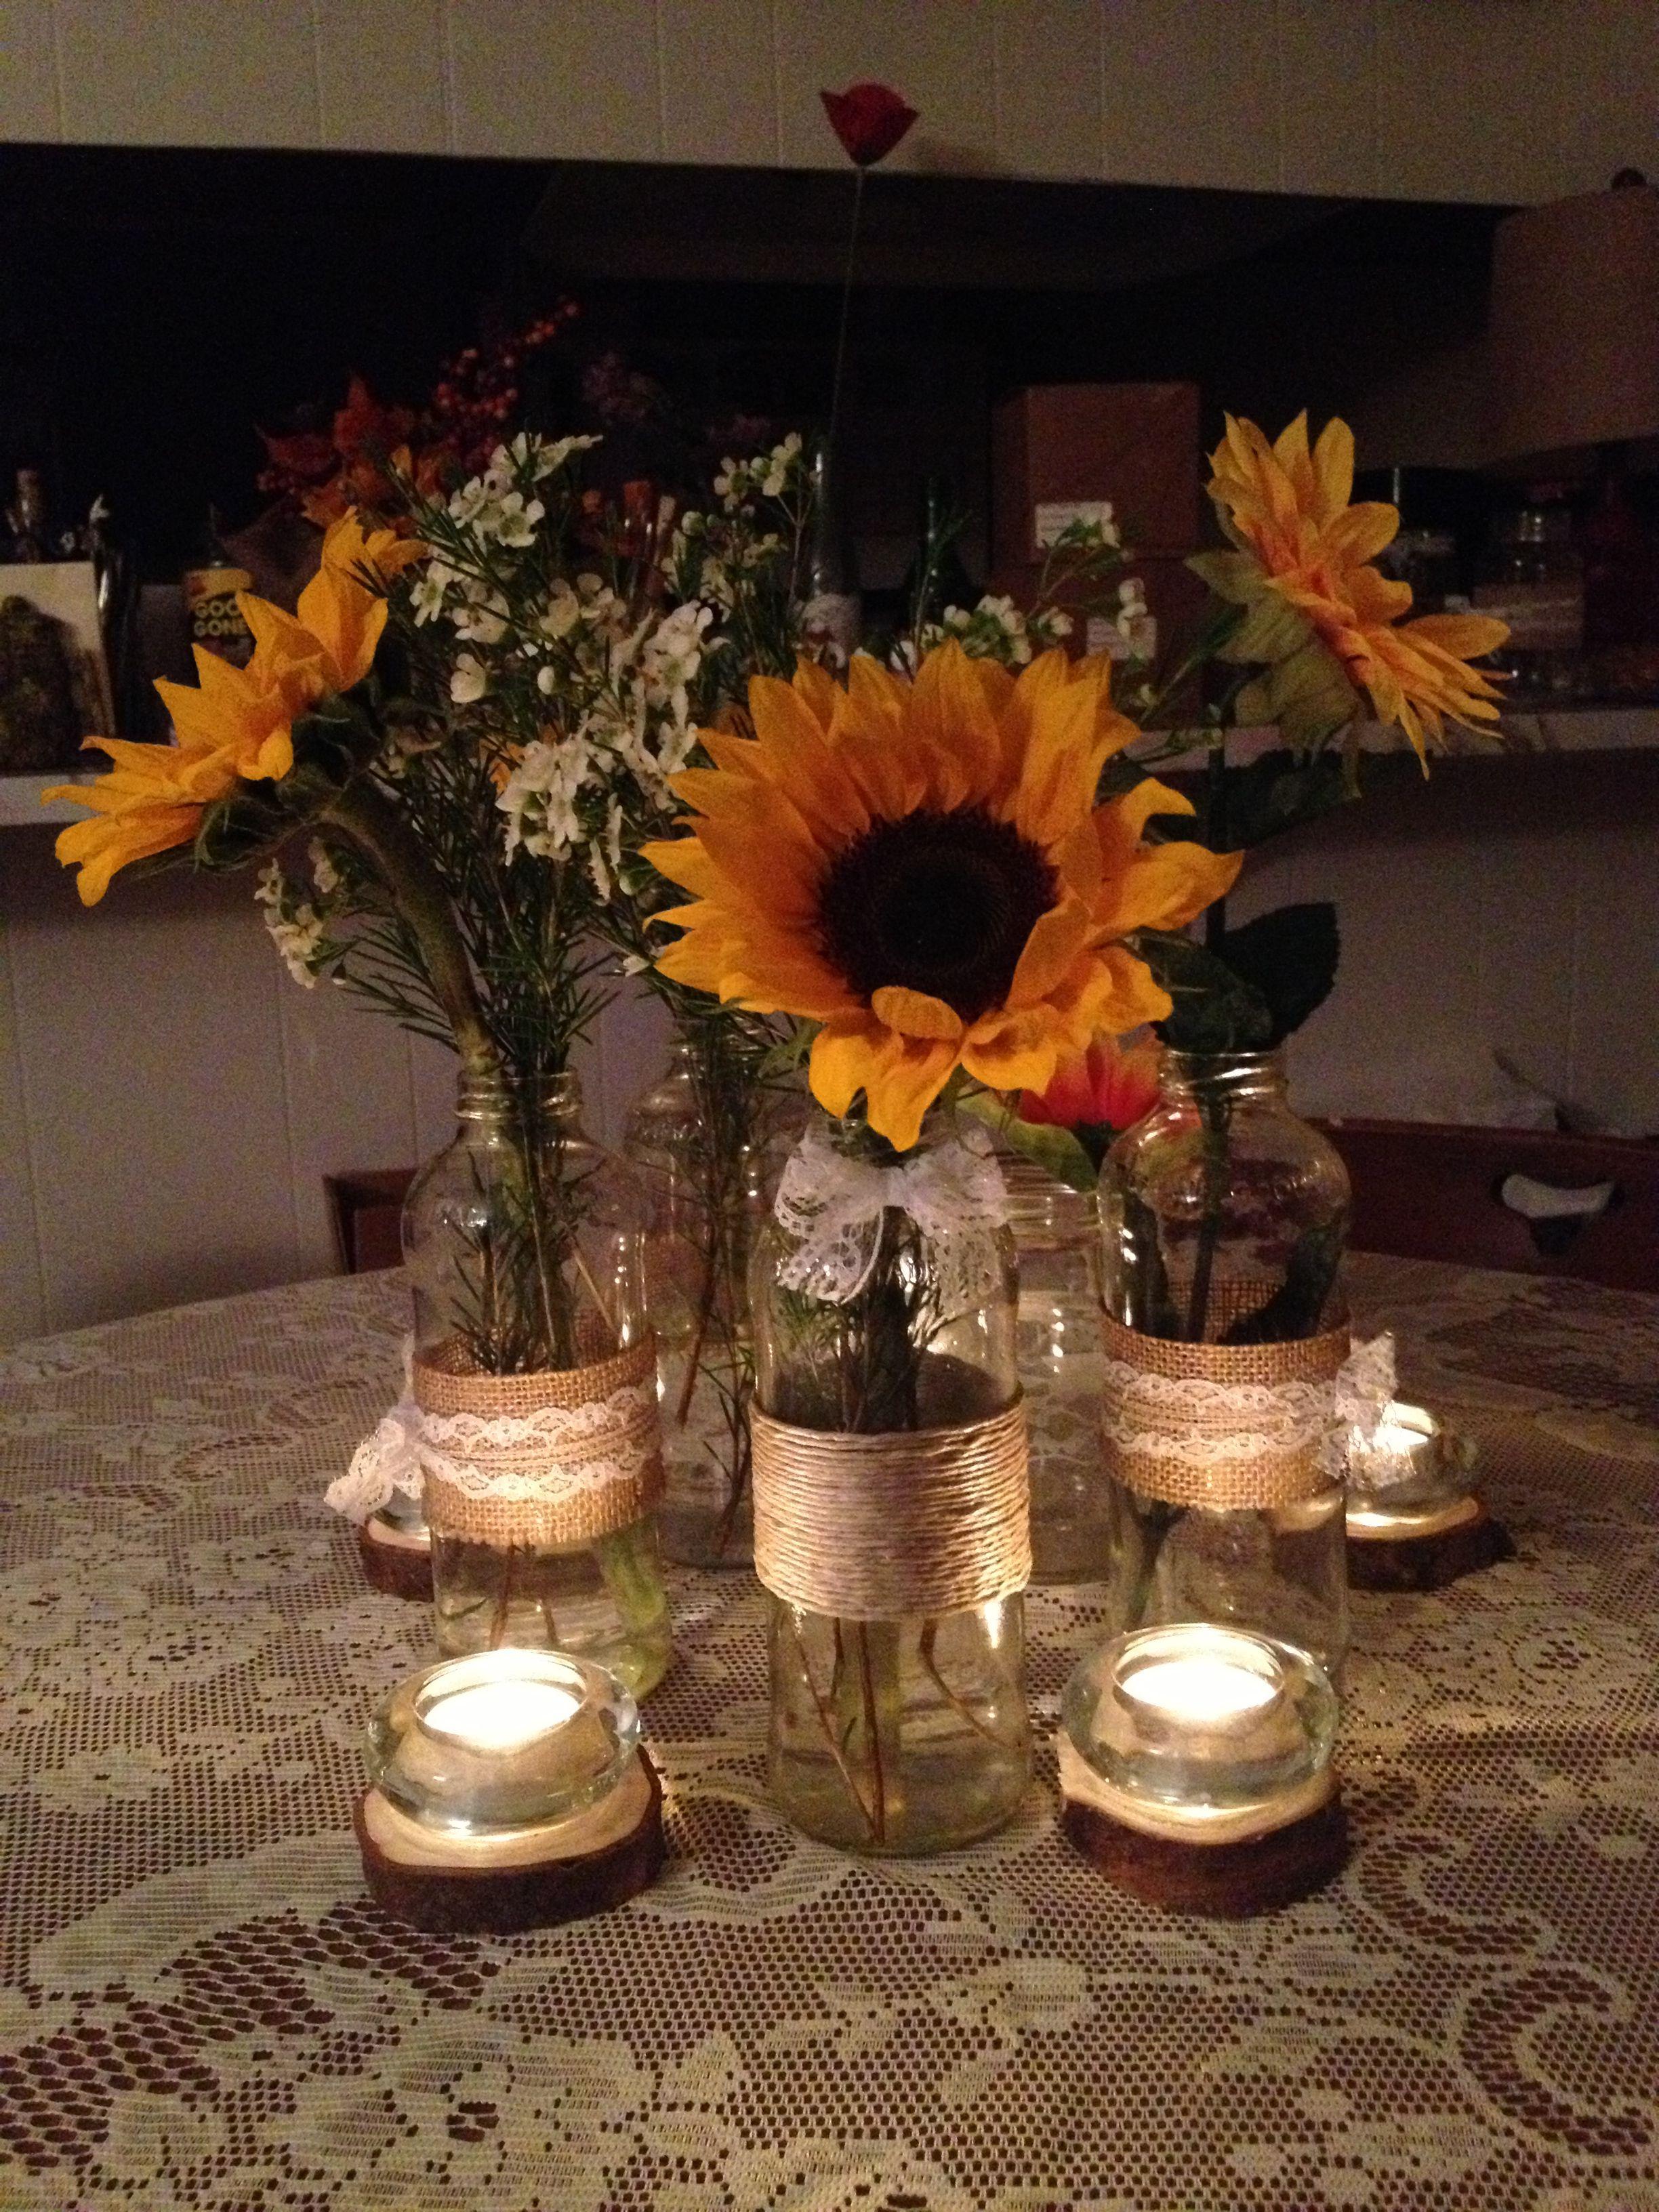 Diy Sunflower centerpieces. Wedding centerpieces diy